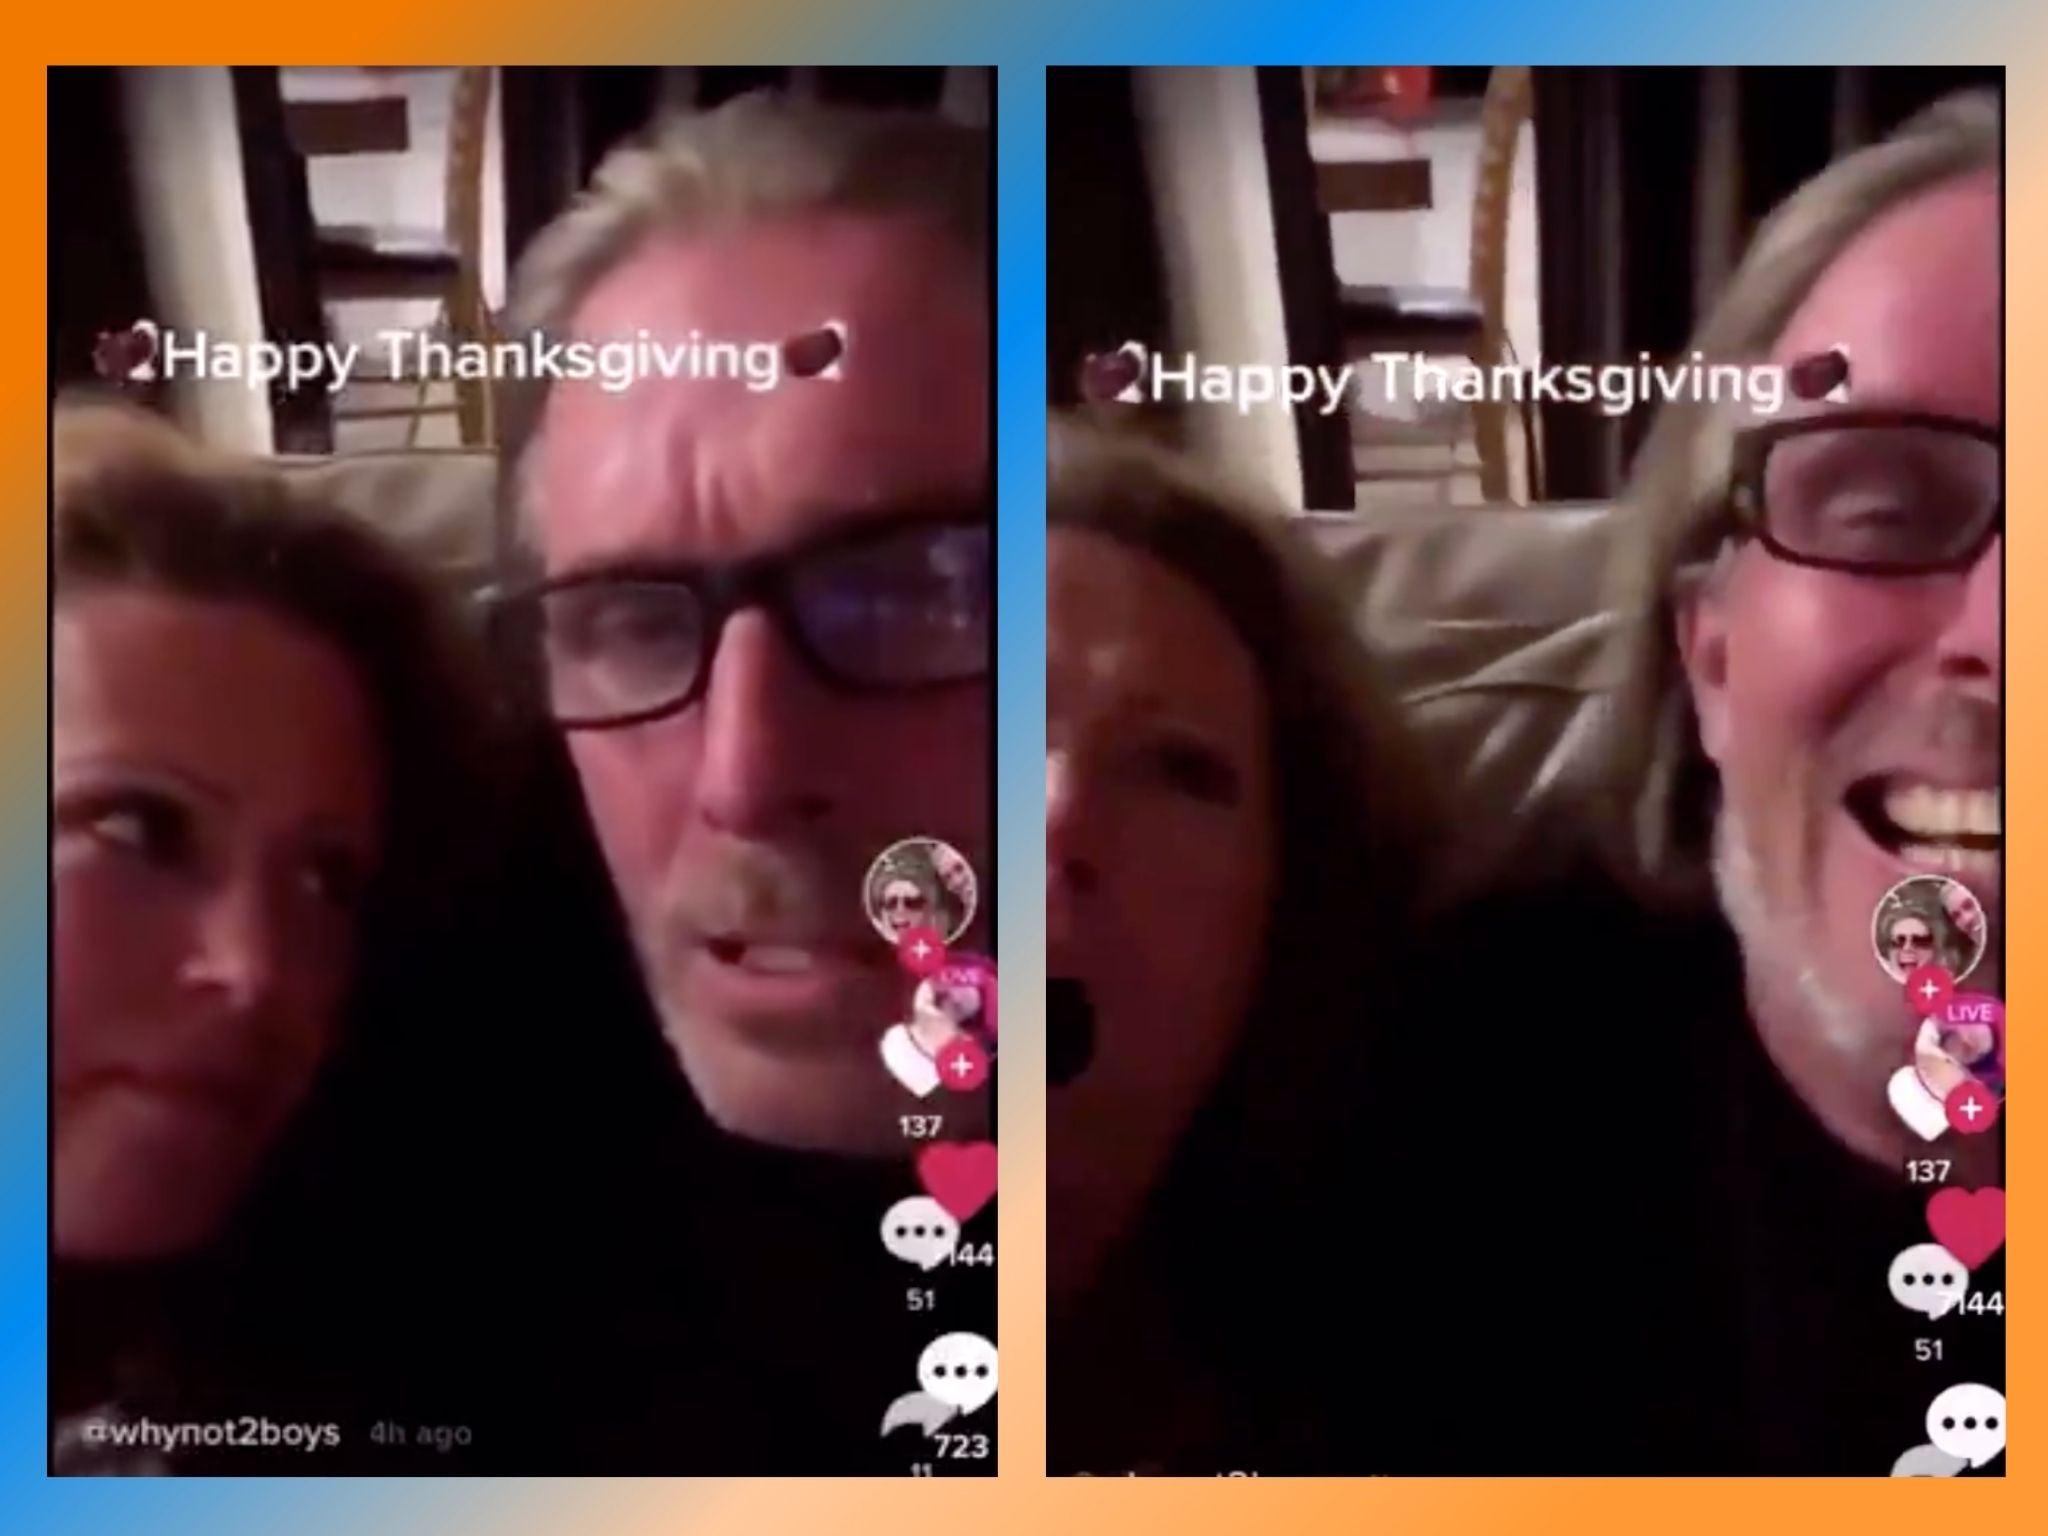 American couple posts 'sickening' video of racist 'joke' about 'Black people'